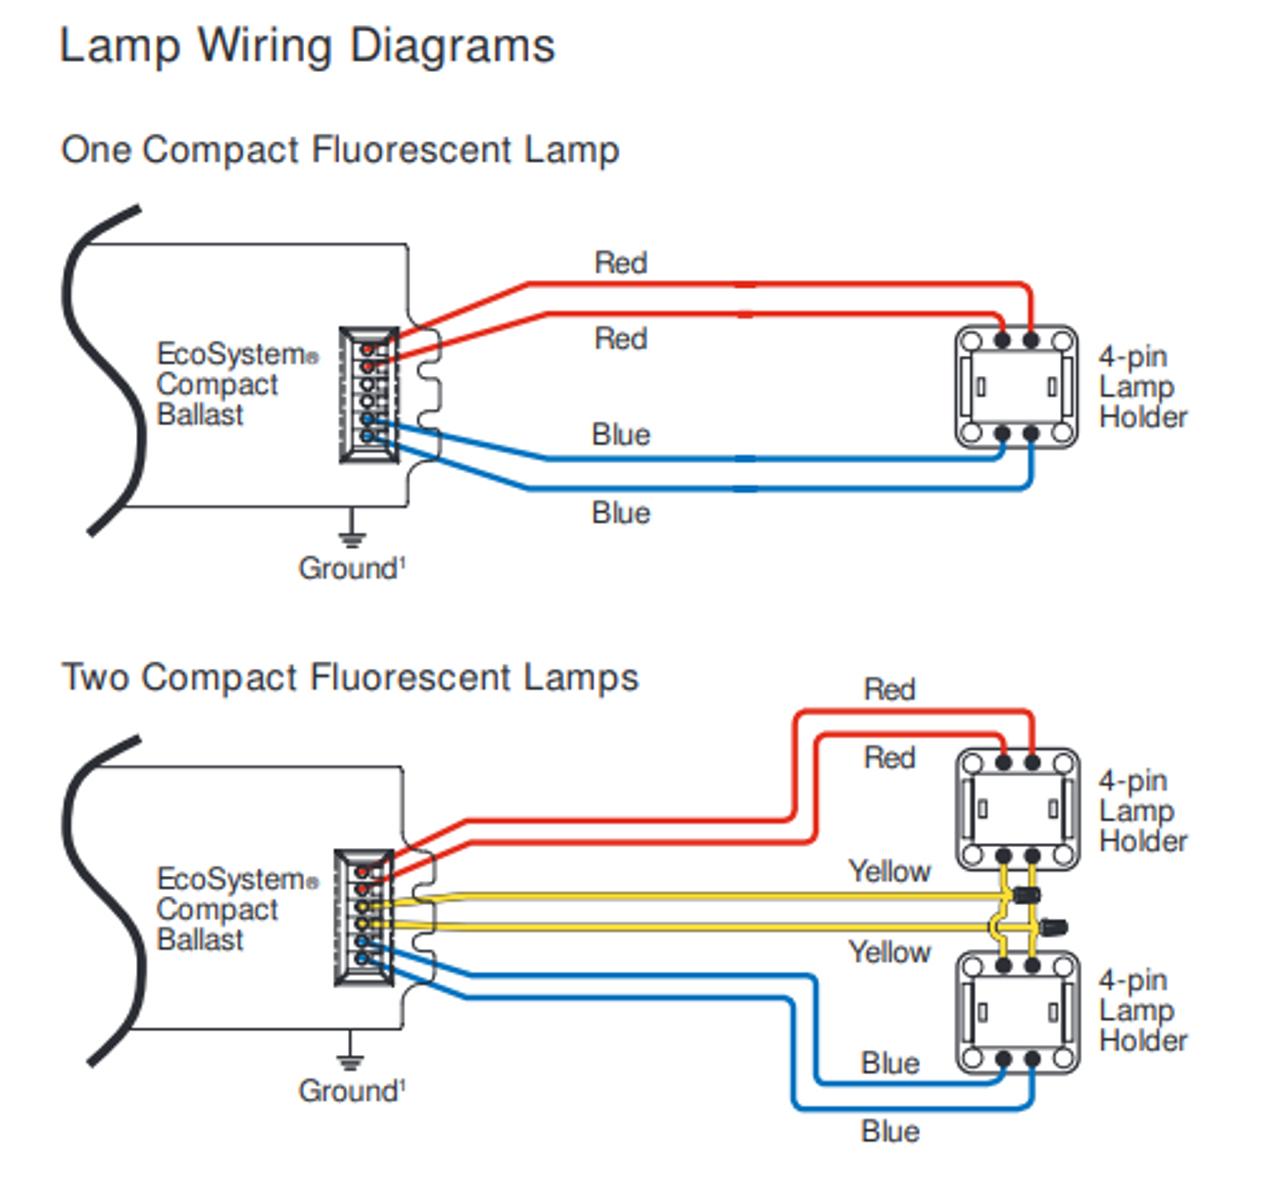 ec3dt4mwku1s lutron ecosystem digital dimming ballasts 0-10v dimming wiring methods lutron dimming ballast wiring diagram 3 #14